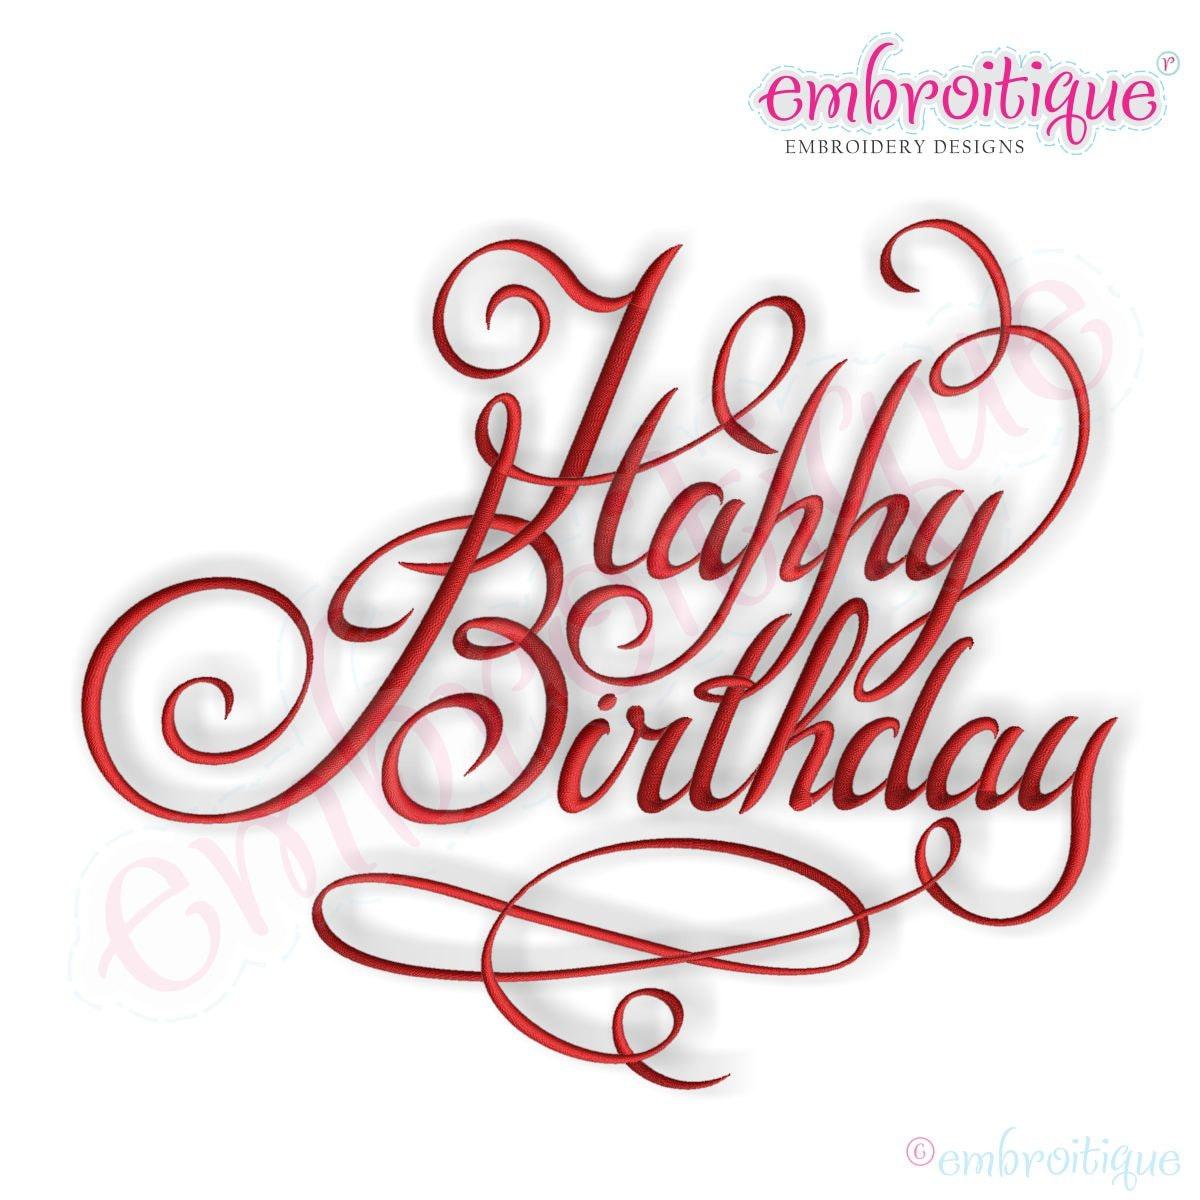 Happy birthday calligraphy script instant download machine